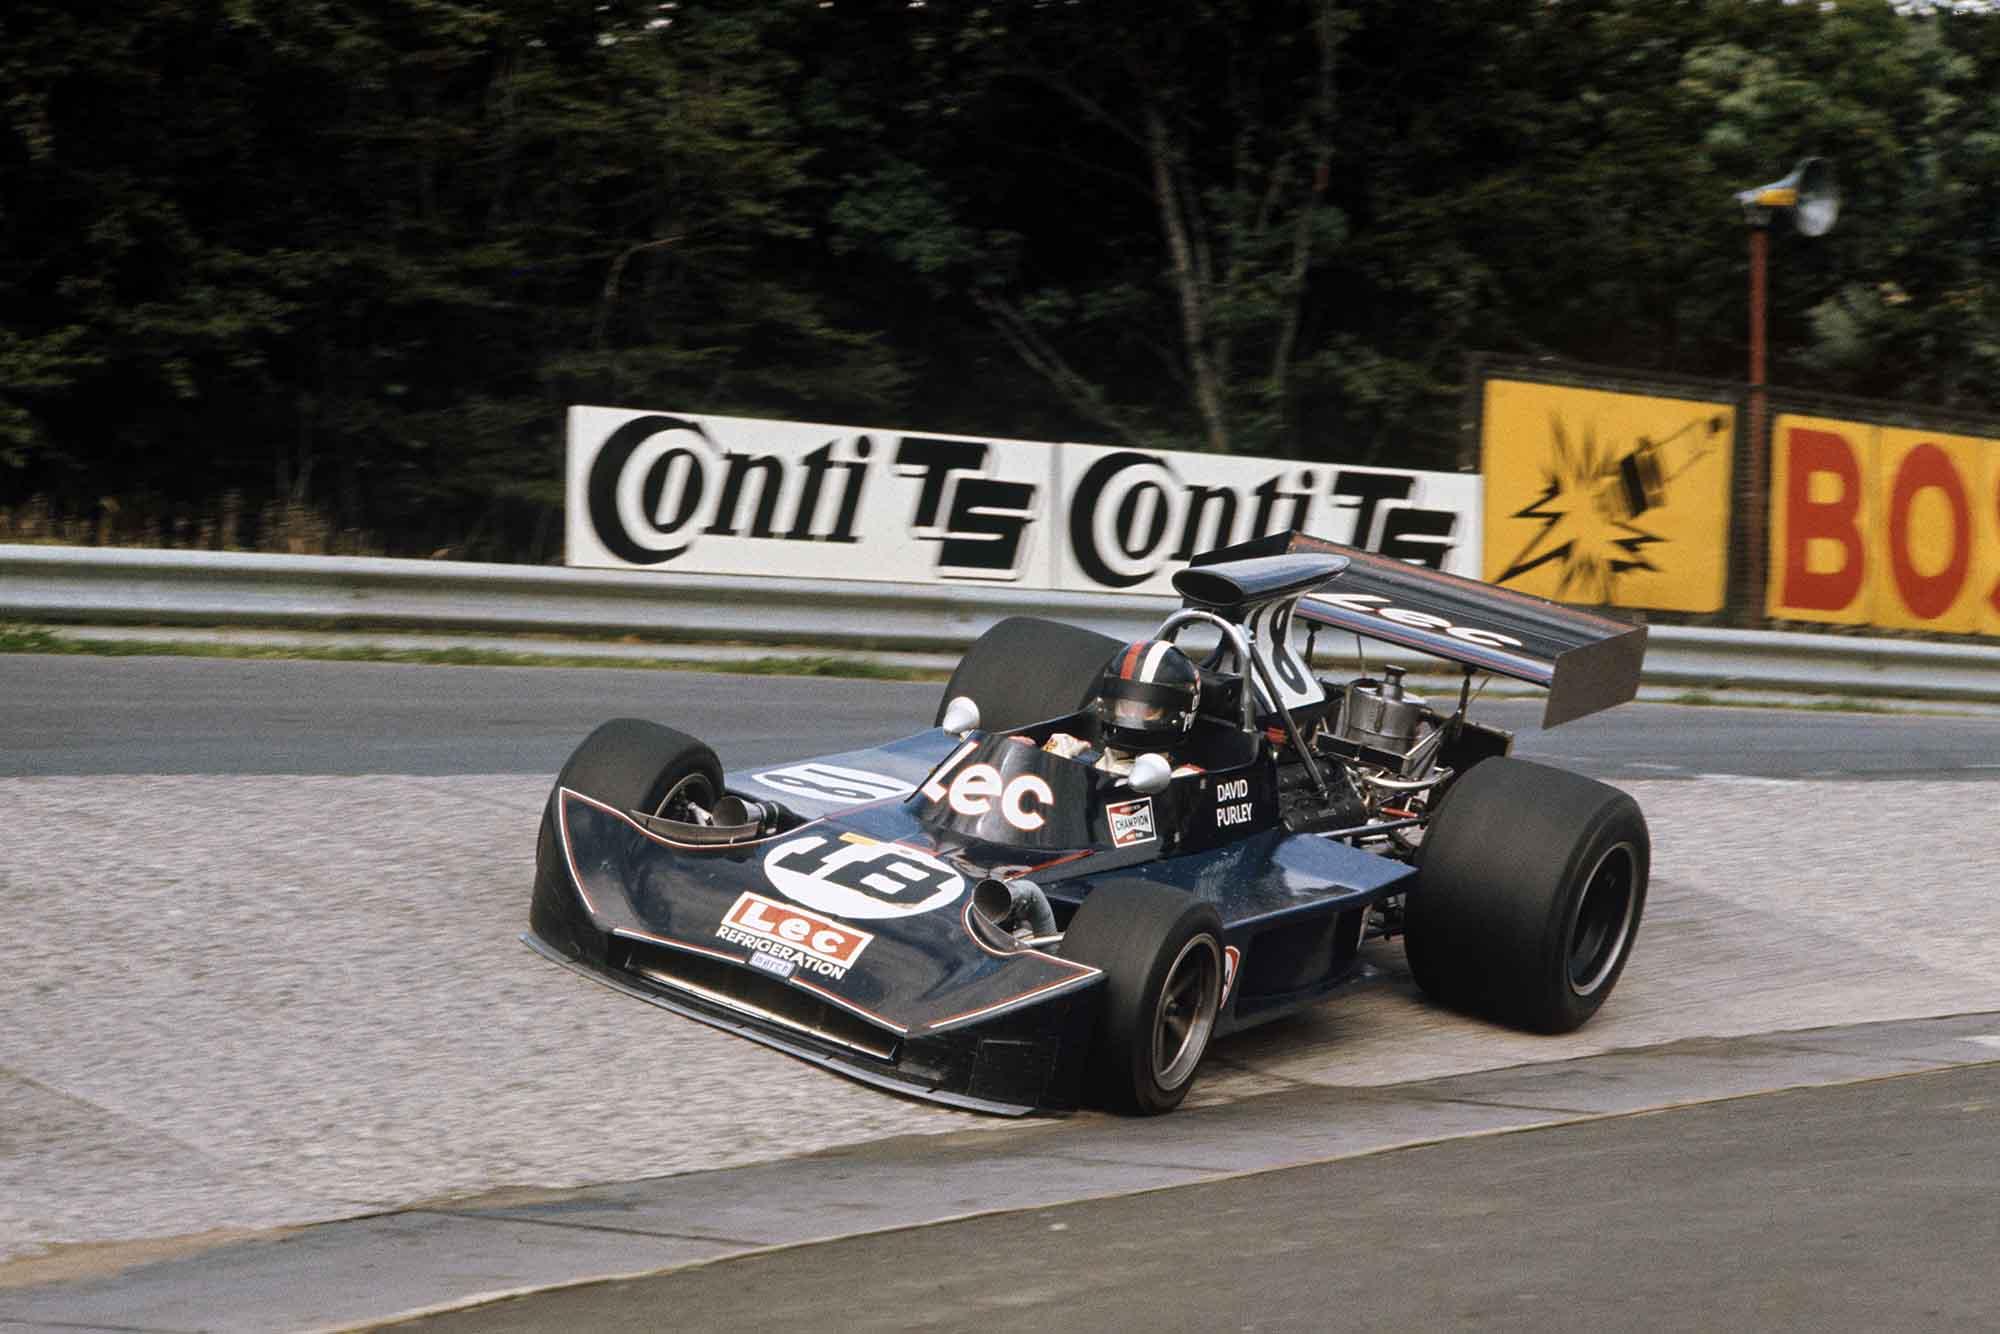 David Purley picks up speed in his Lec-March at the 1973 German Grand Prix Nurburgring Prix